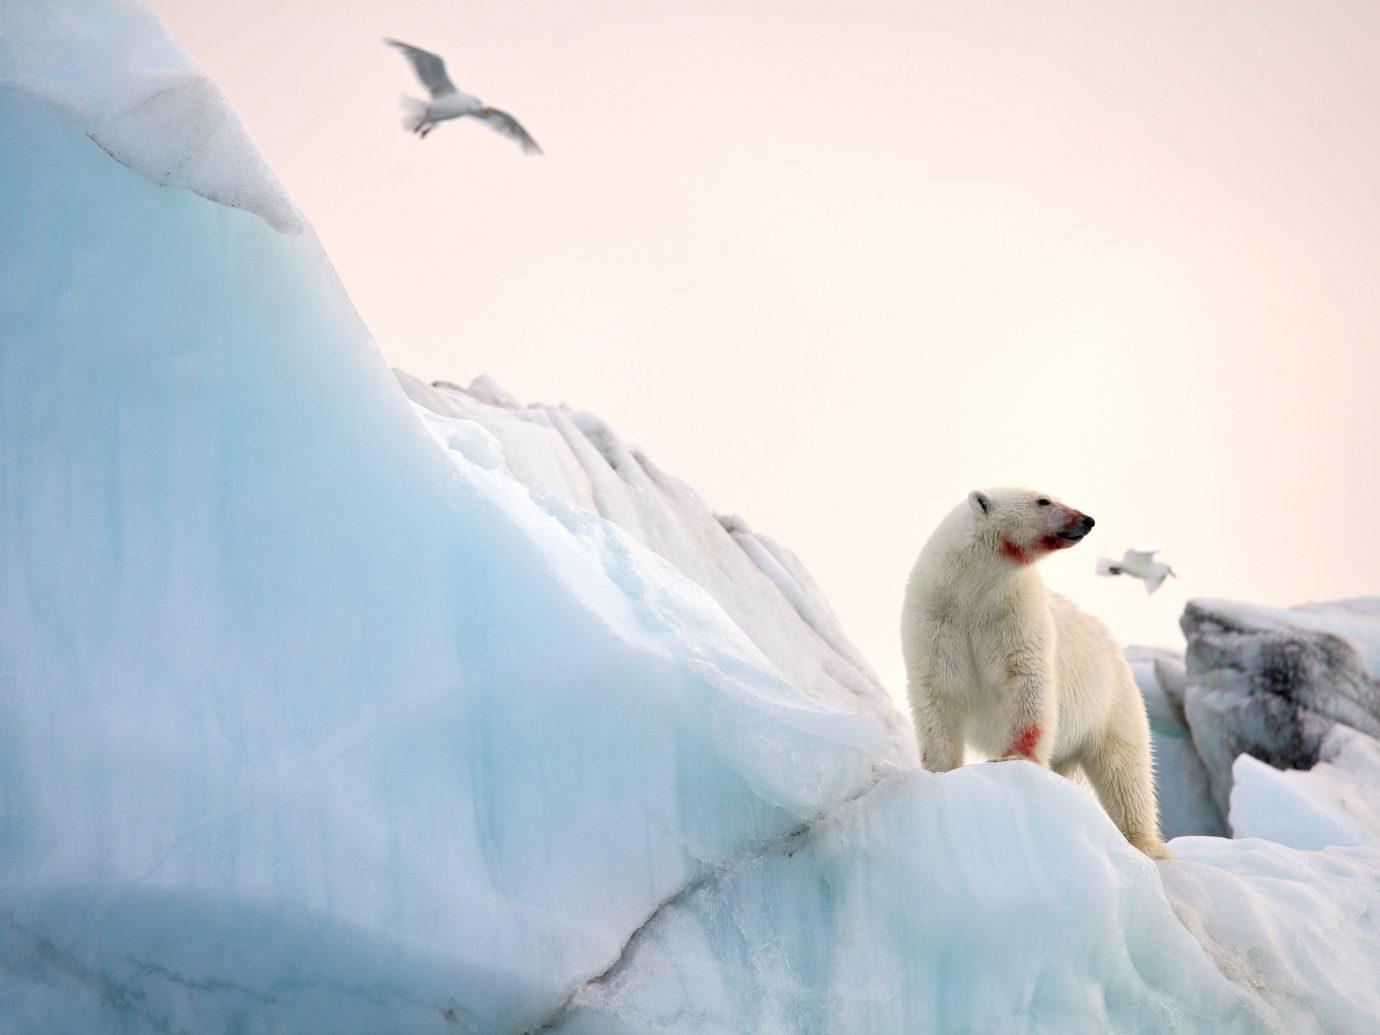 Adventure snow outdoor arctic ice Nature sky flightless bird arctic ocean polar ice cap freezing ice cap glacial landform polar bear beak sea ice Bird winter storm day